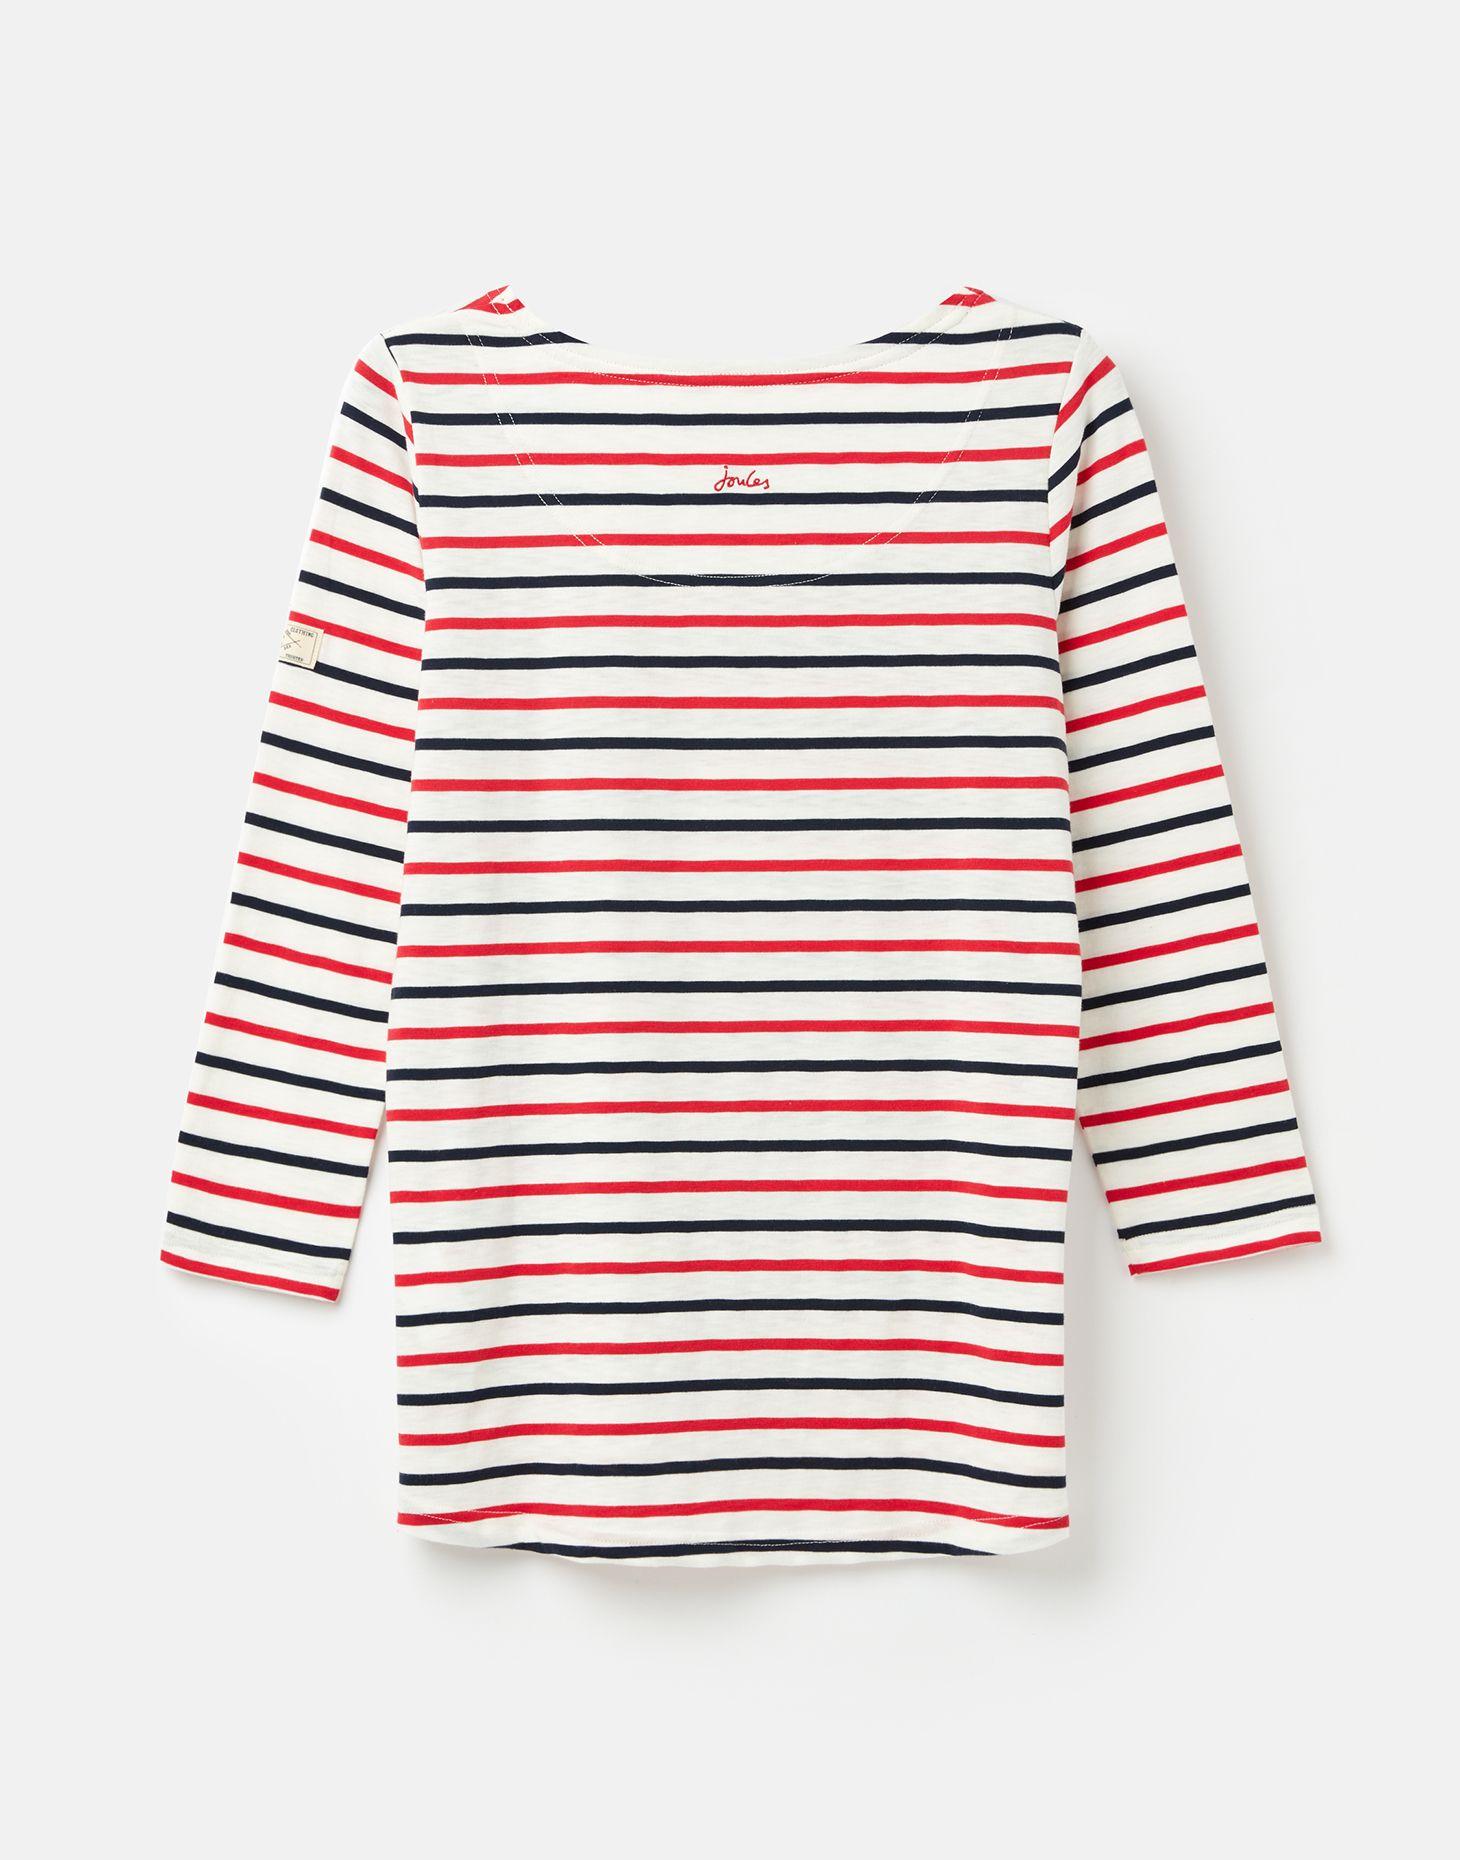 Joules Harbour Top Stripes 3//4 Sleeves  UK6 8 10 12 14 16 18 20